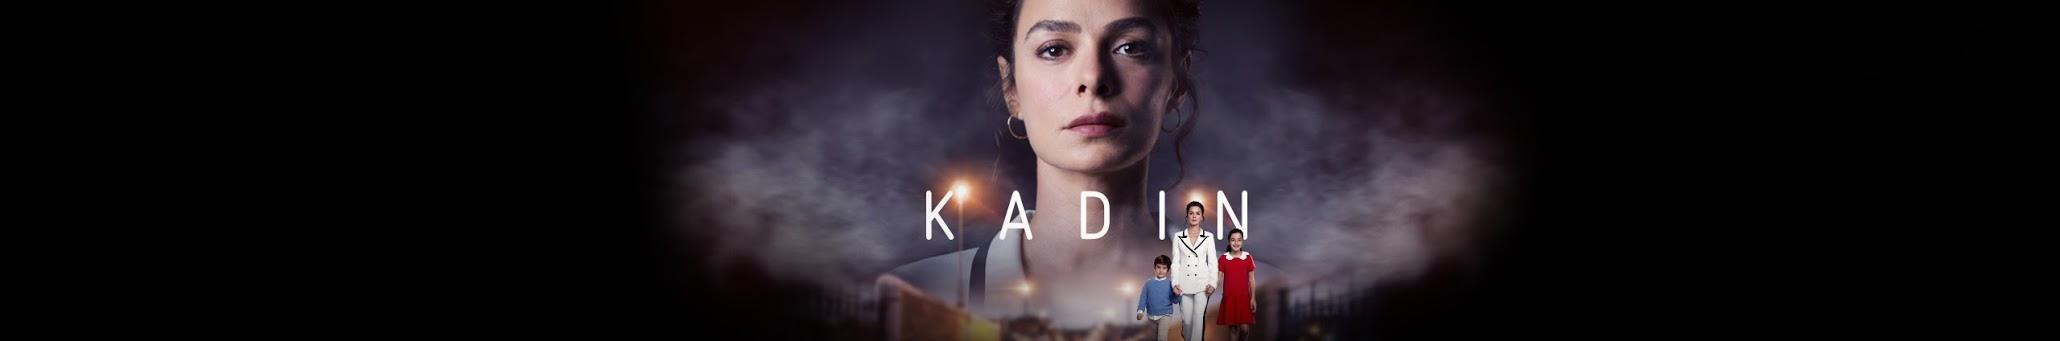 Kadin Season 1 English subtitles | Woman